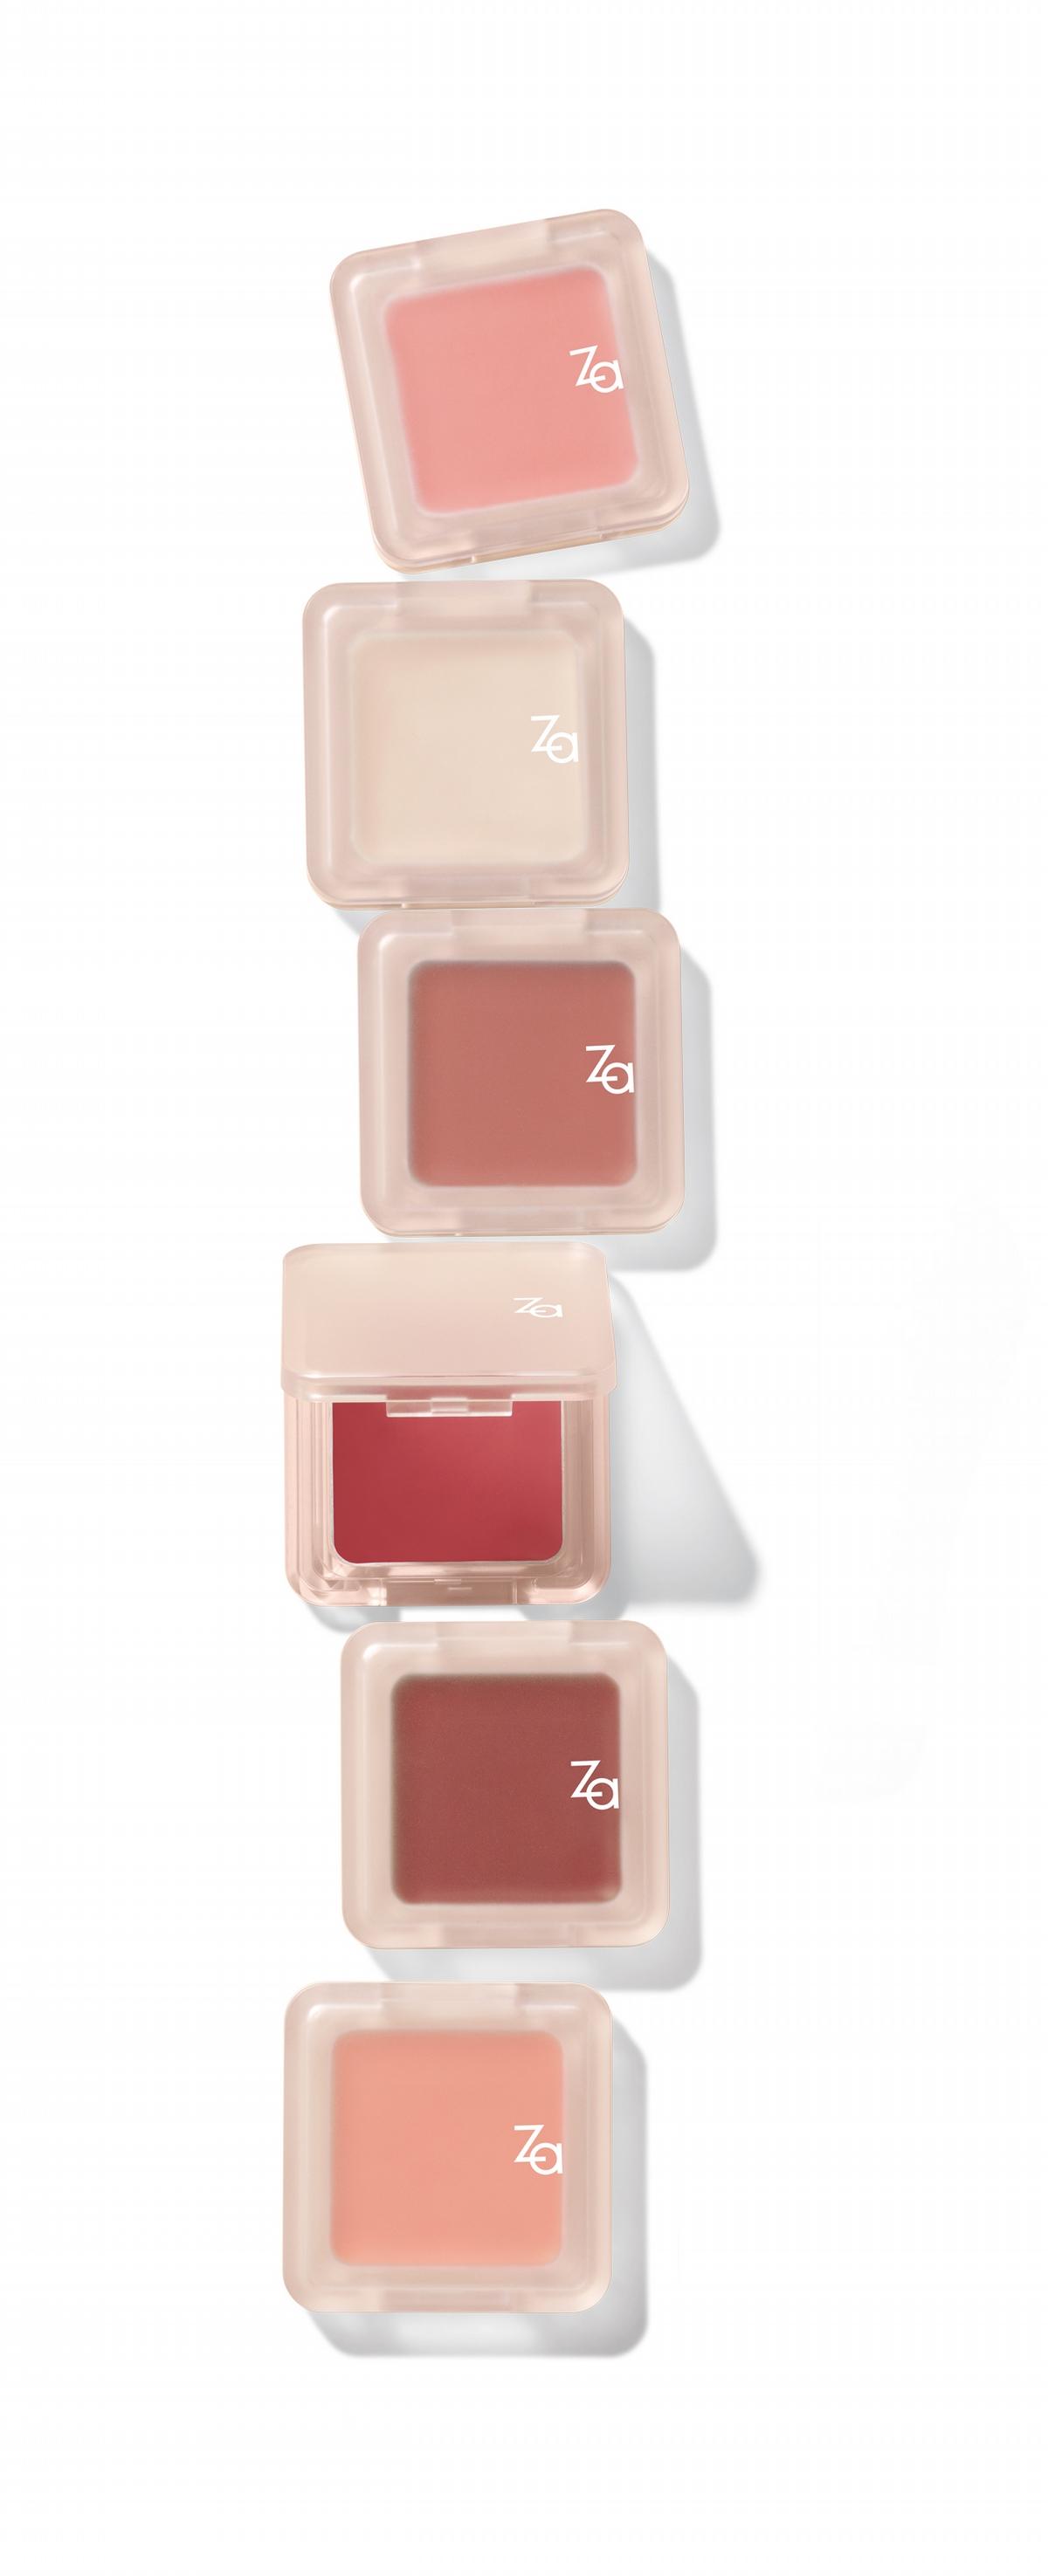 ZA 6款特調腮紅霜超生火!一抹臉蛋立即膨膨好像蘋果肌,顯色又服貼, 「#04烏龍茶酒」、「#05粉紅香檳」必買